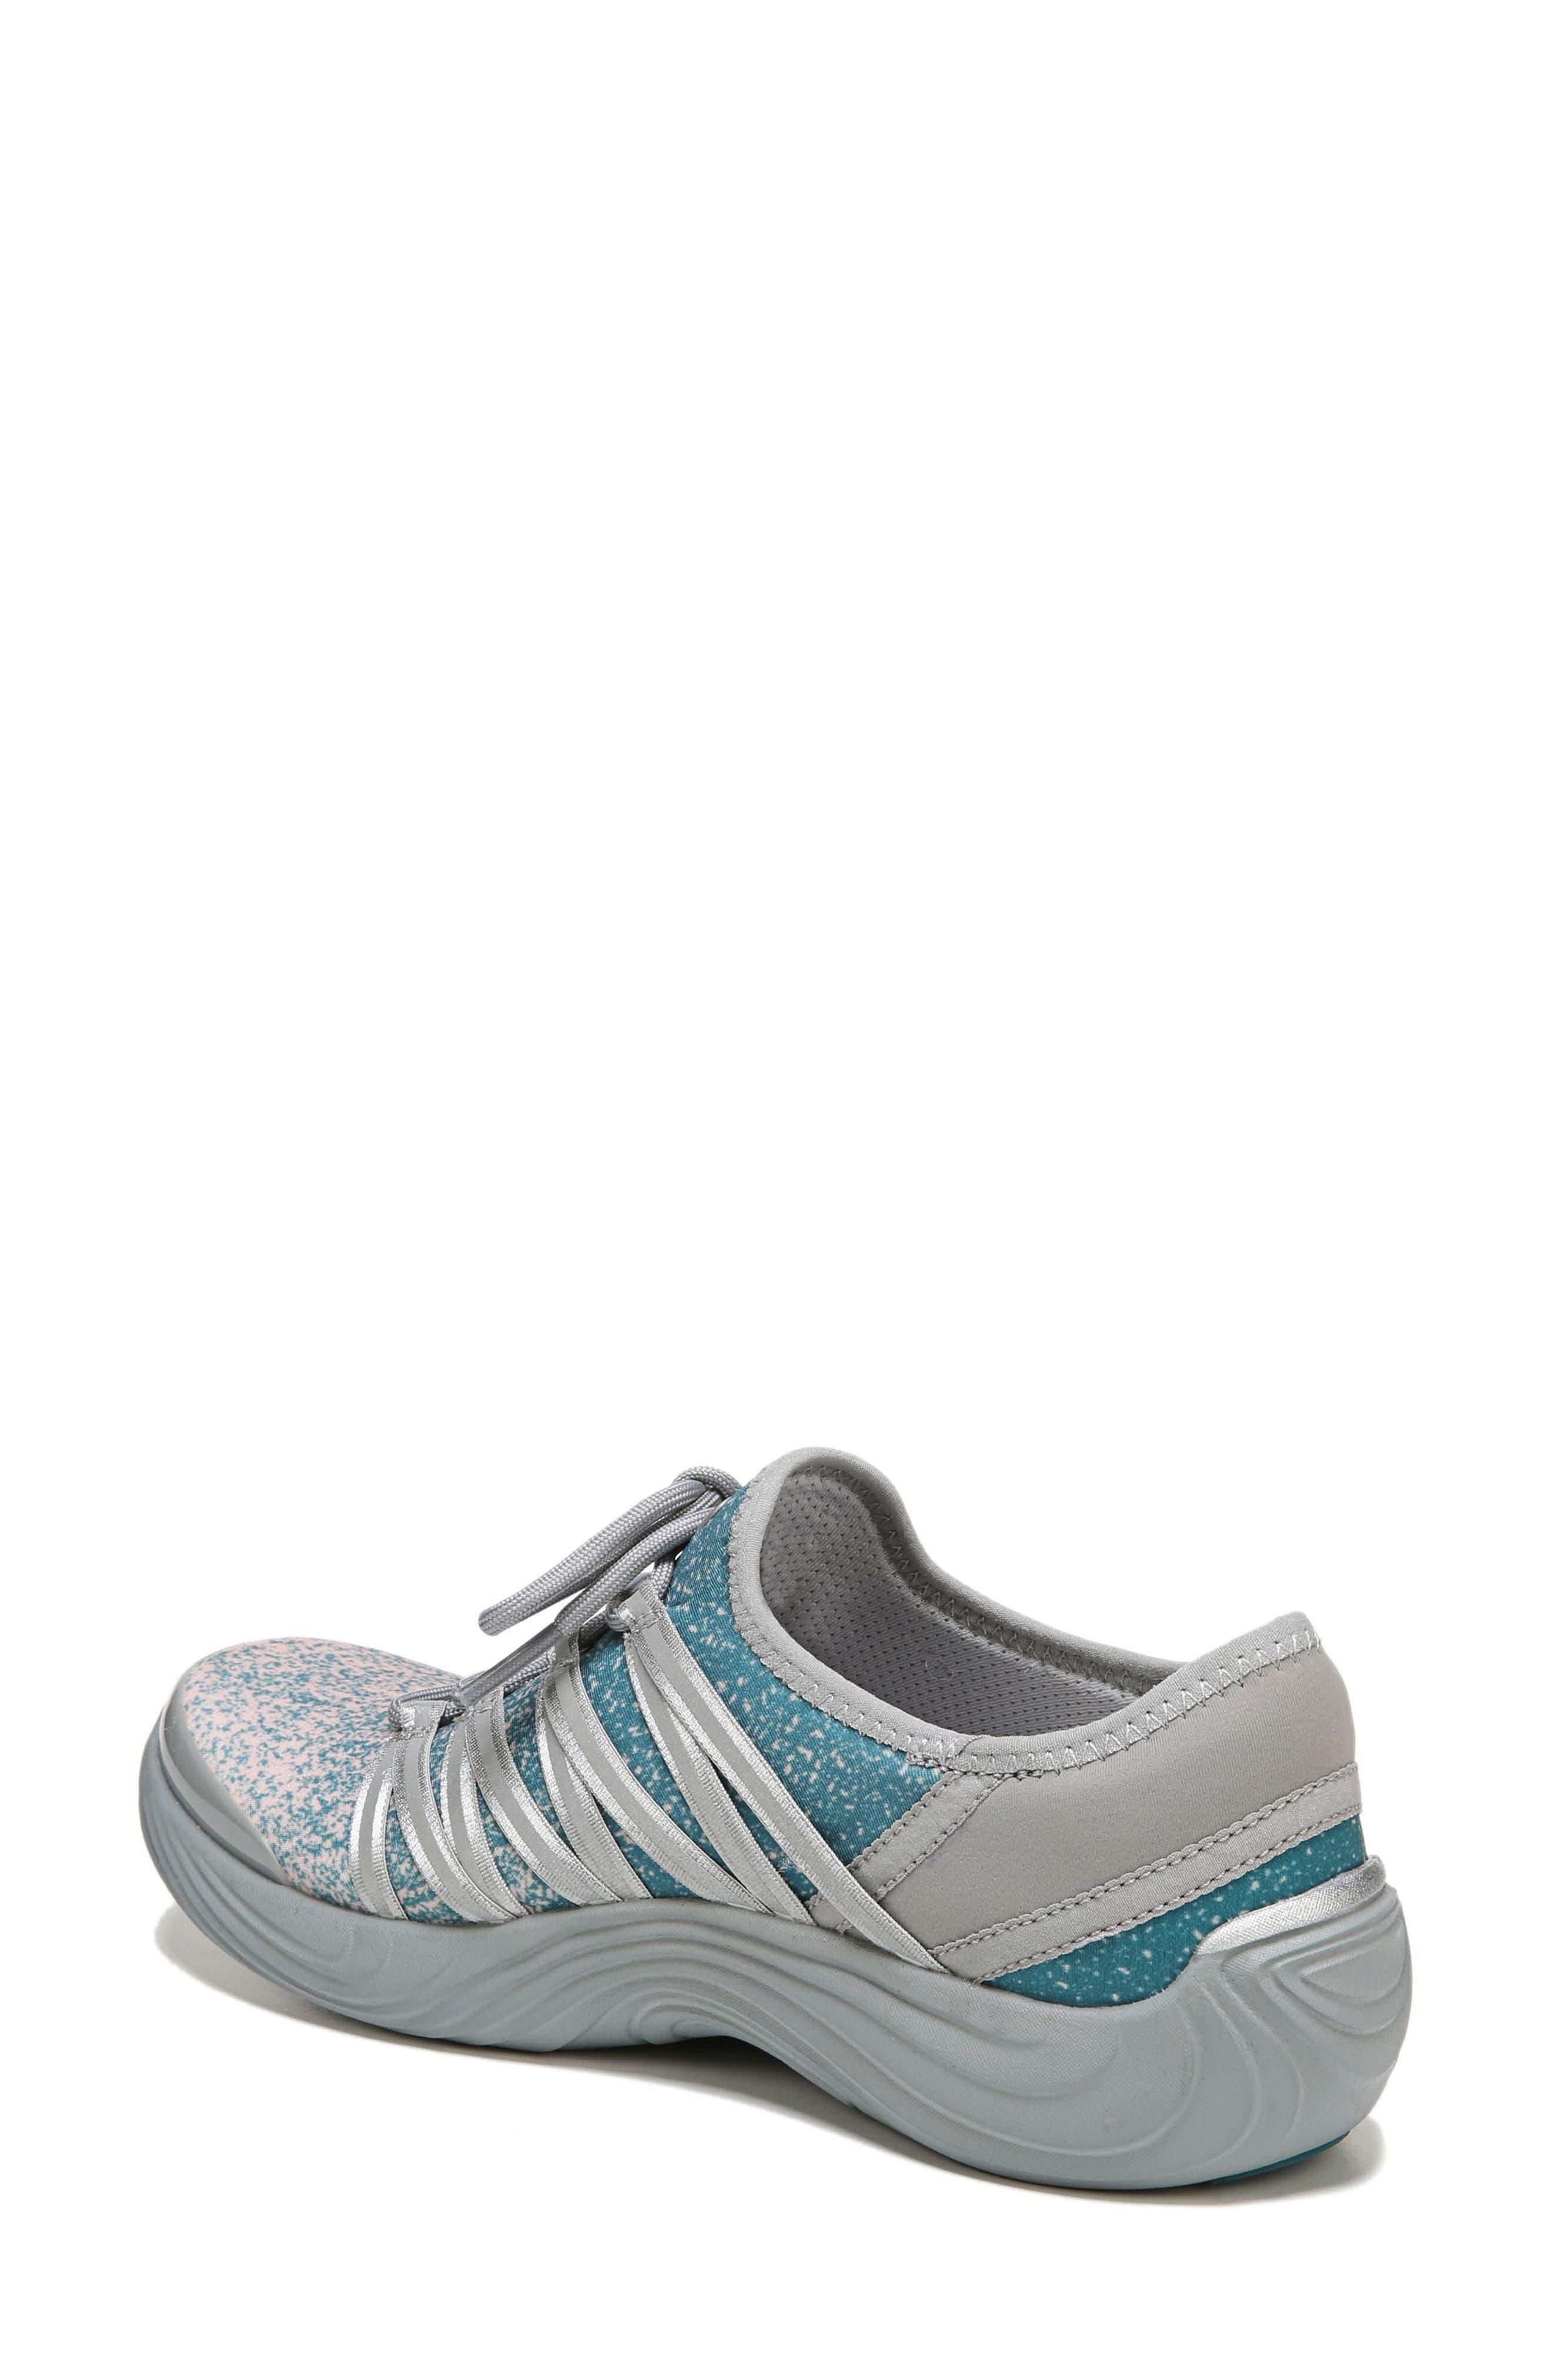 Tender Sneaker,                             Alternate thumbnail 2, color,                             Pink Fabric